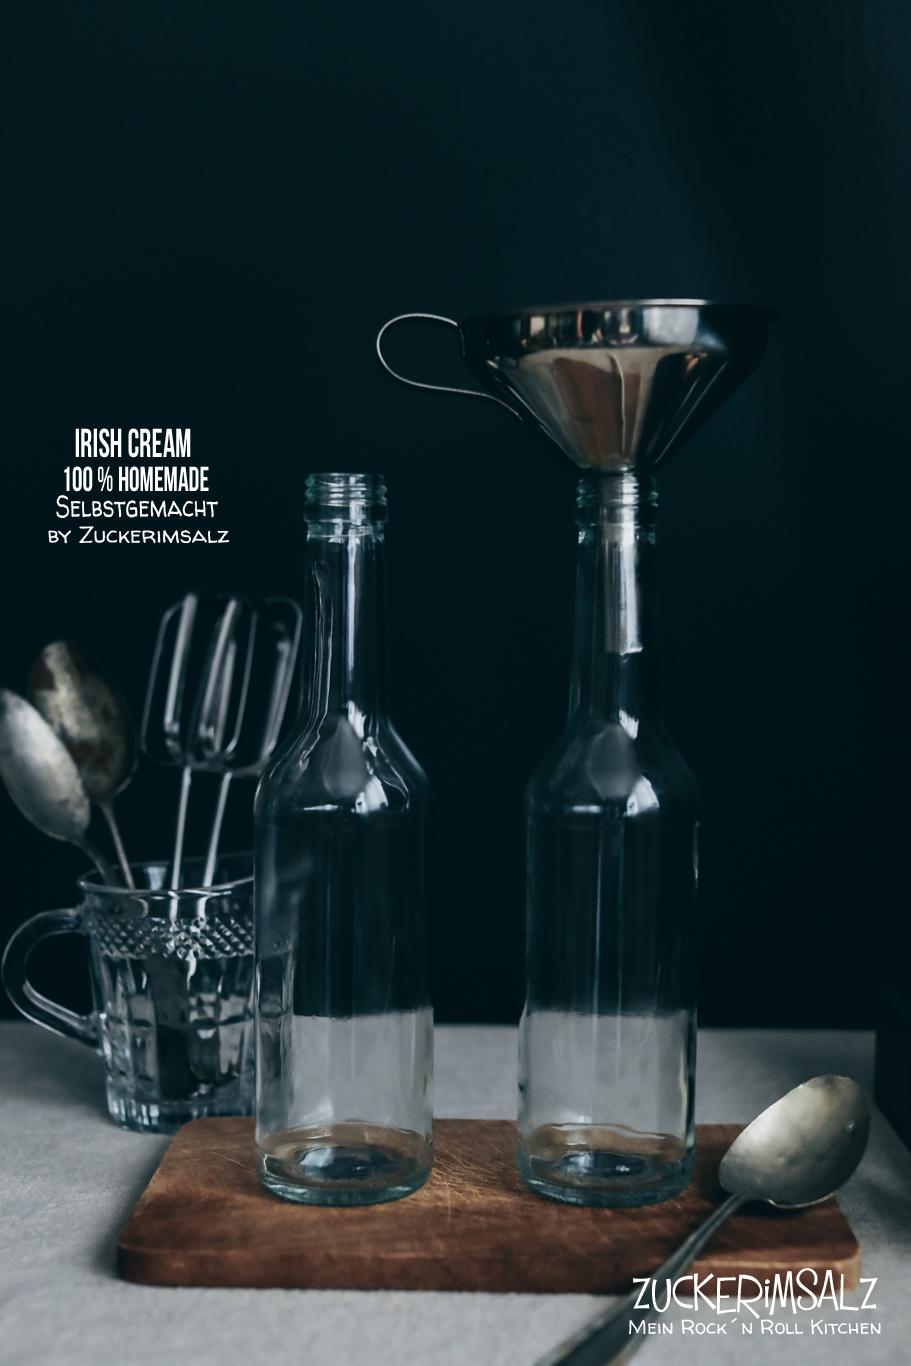 Sahne, Likör, Schoko, Kaffee, irish, cream, baileys, selbstgemacht, selber machen, Homemade, Rezept, Ostern, Geschenk, verschenken